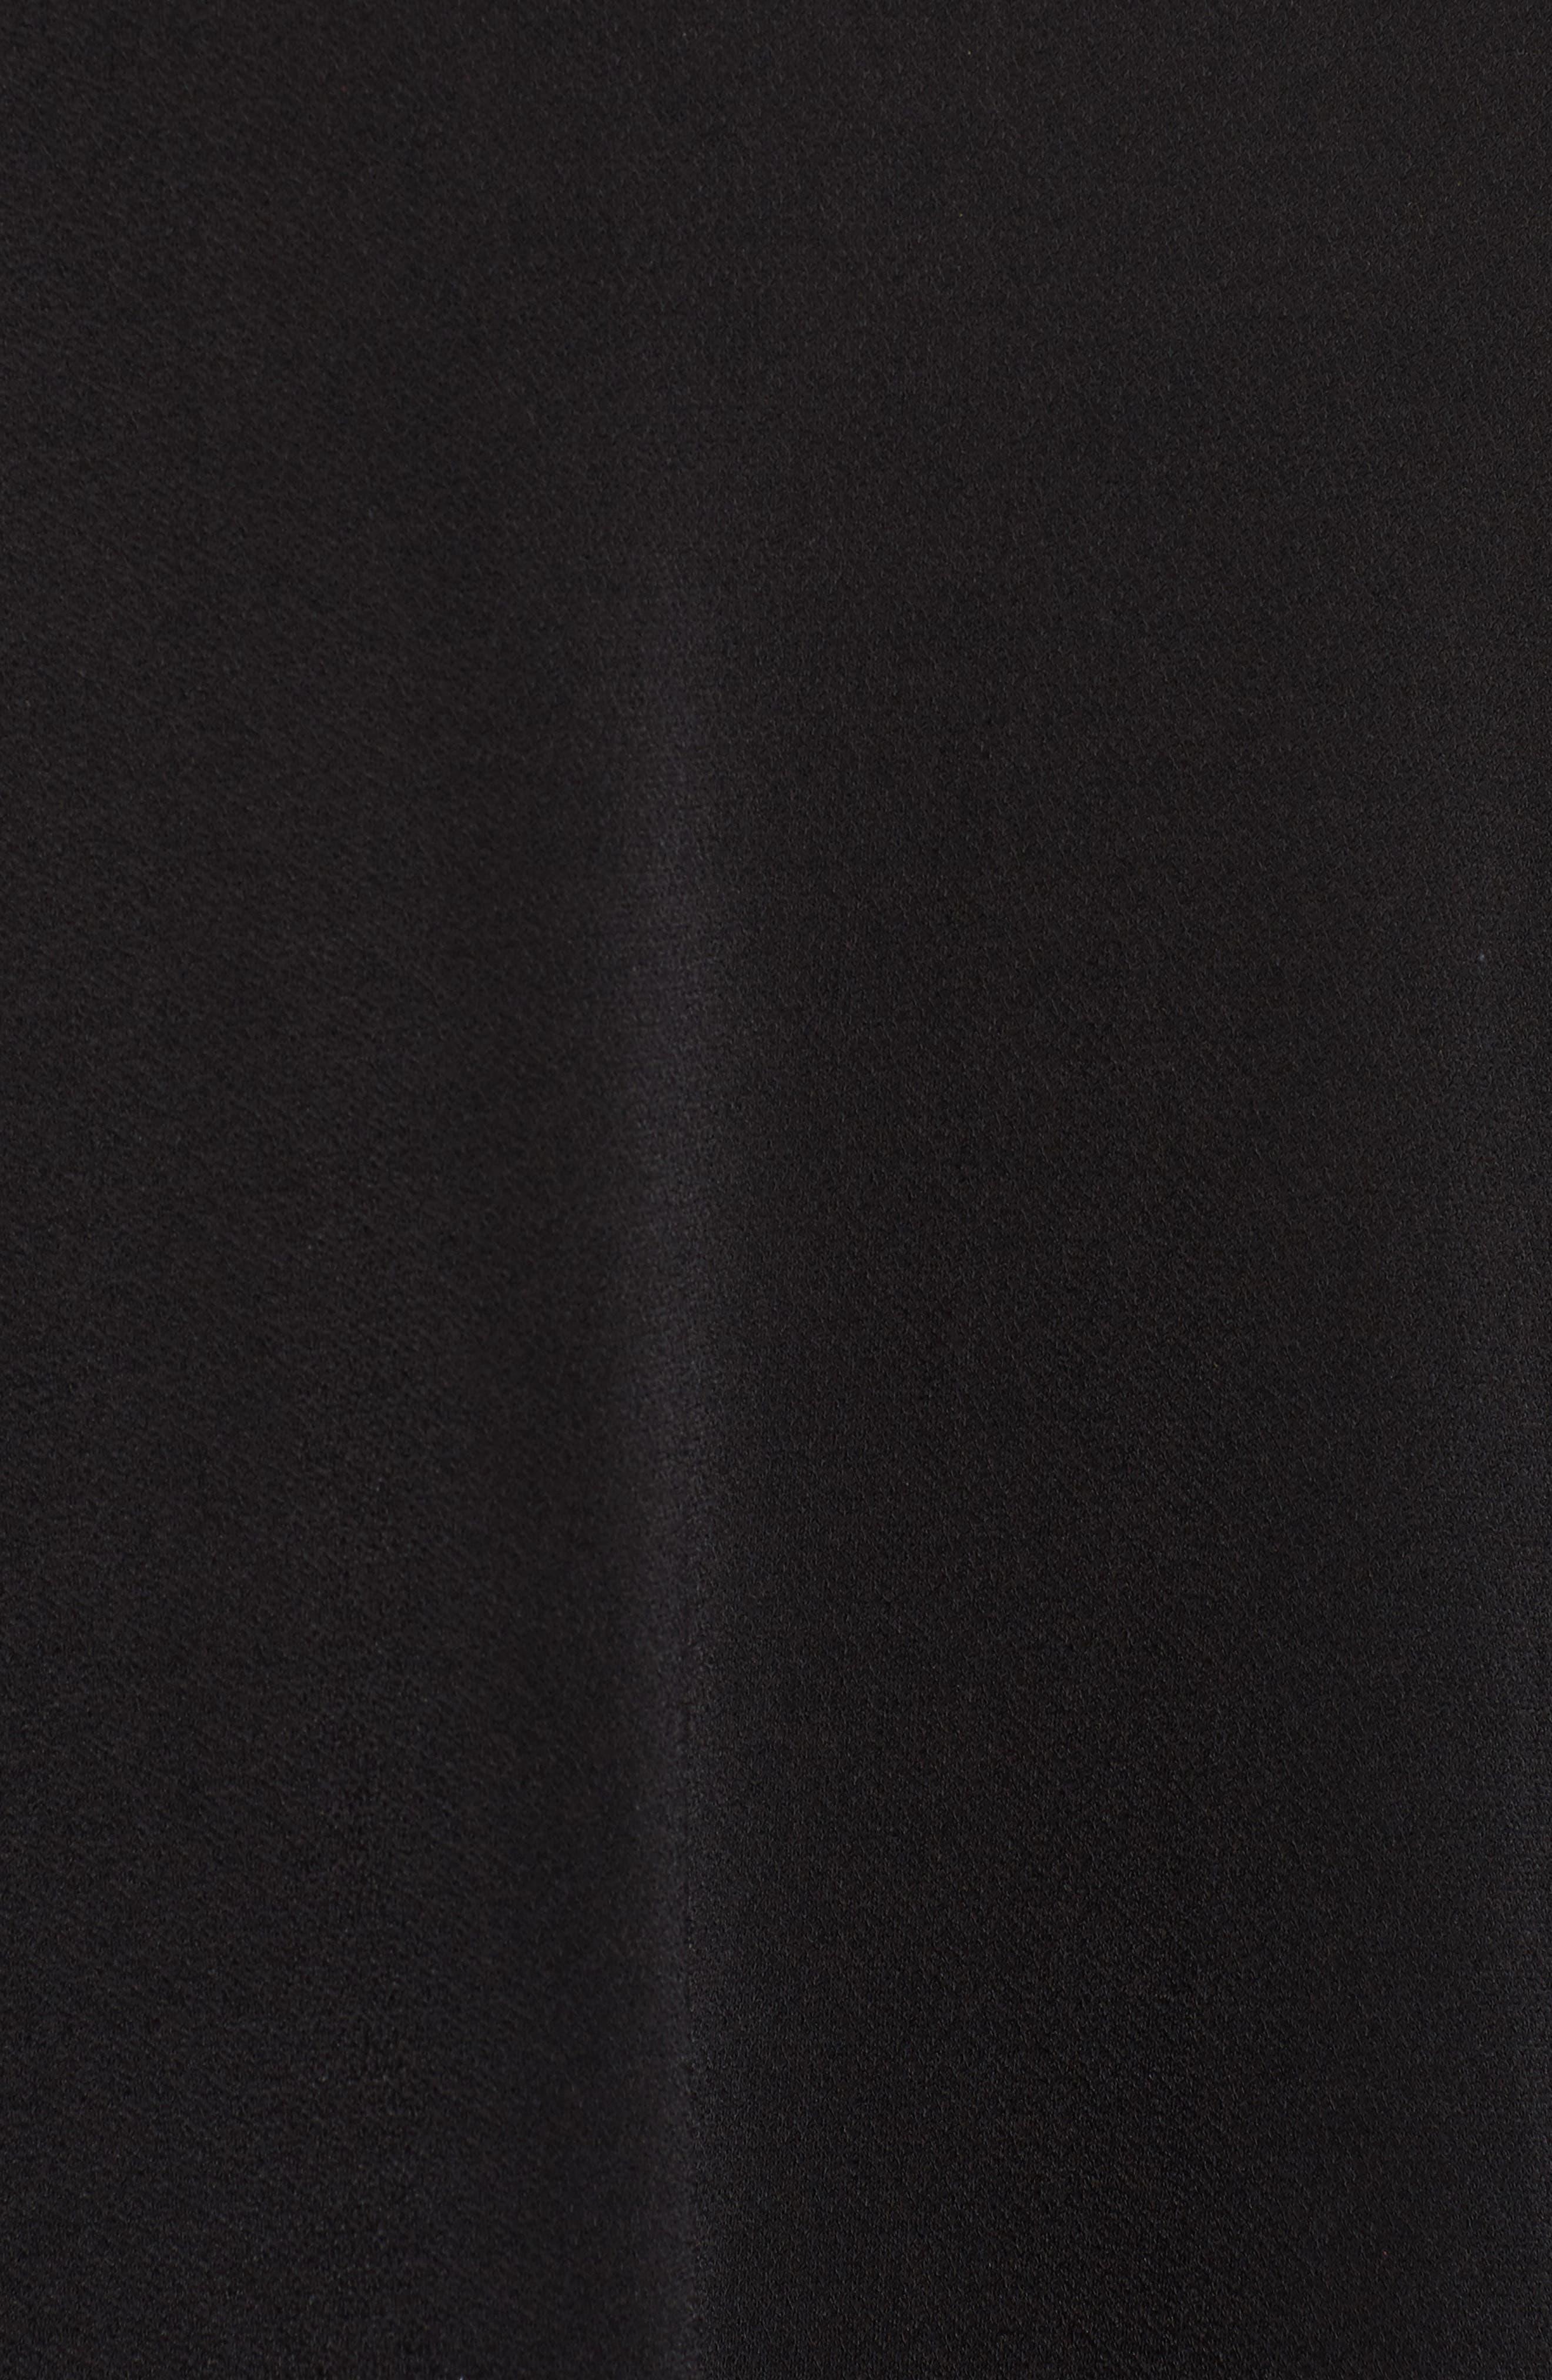 Bell Sleeve A-Line Choker Dress,                             Alternate thumbnail 5, color,                             001